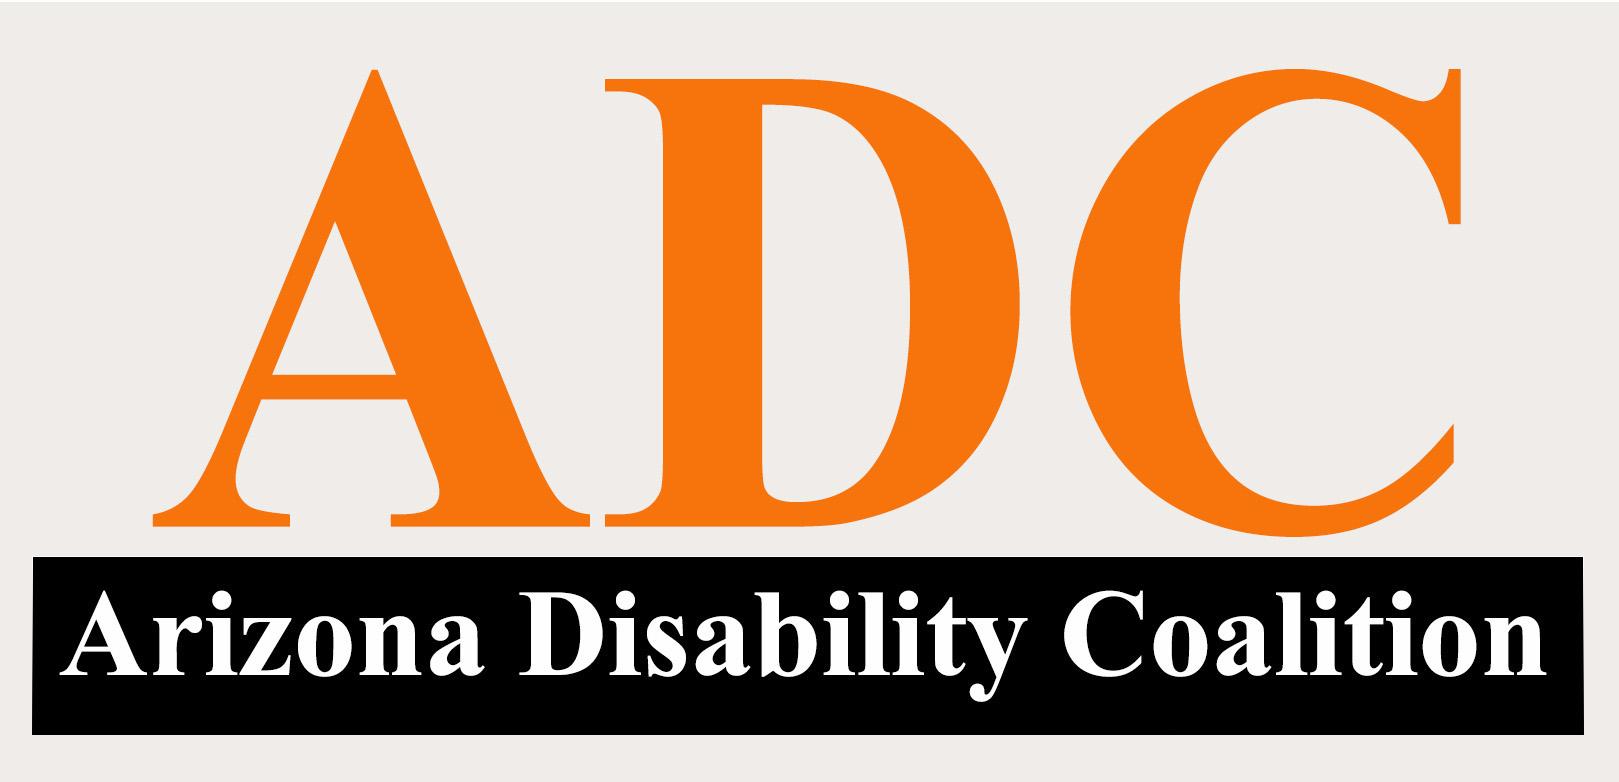 The Arizona Disability Coalition